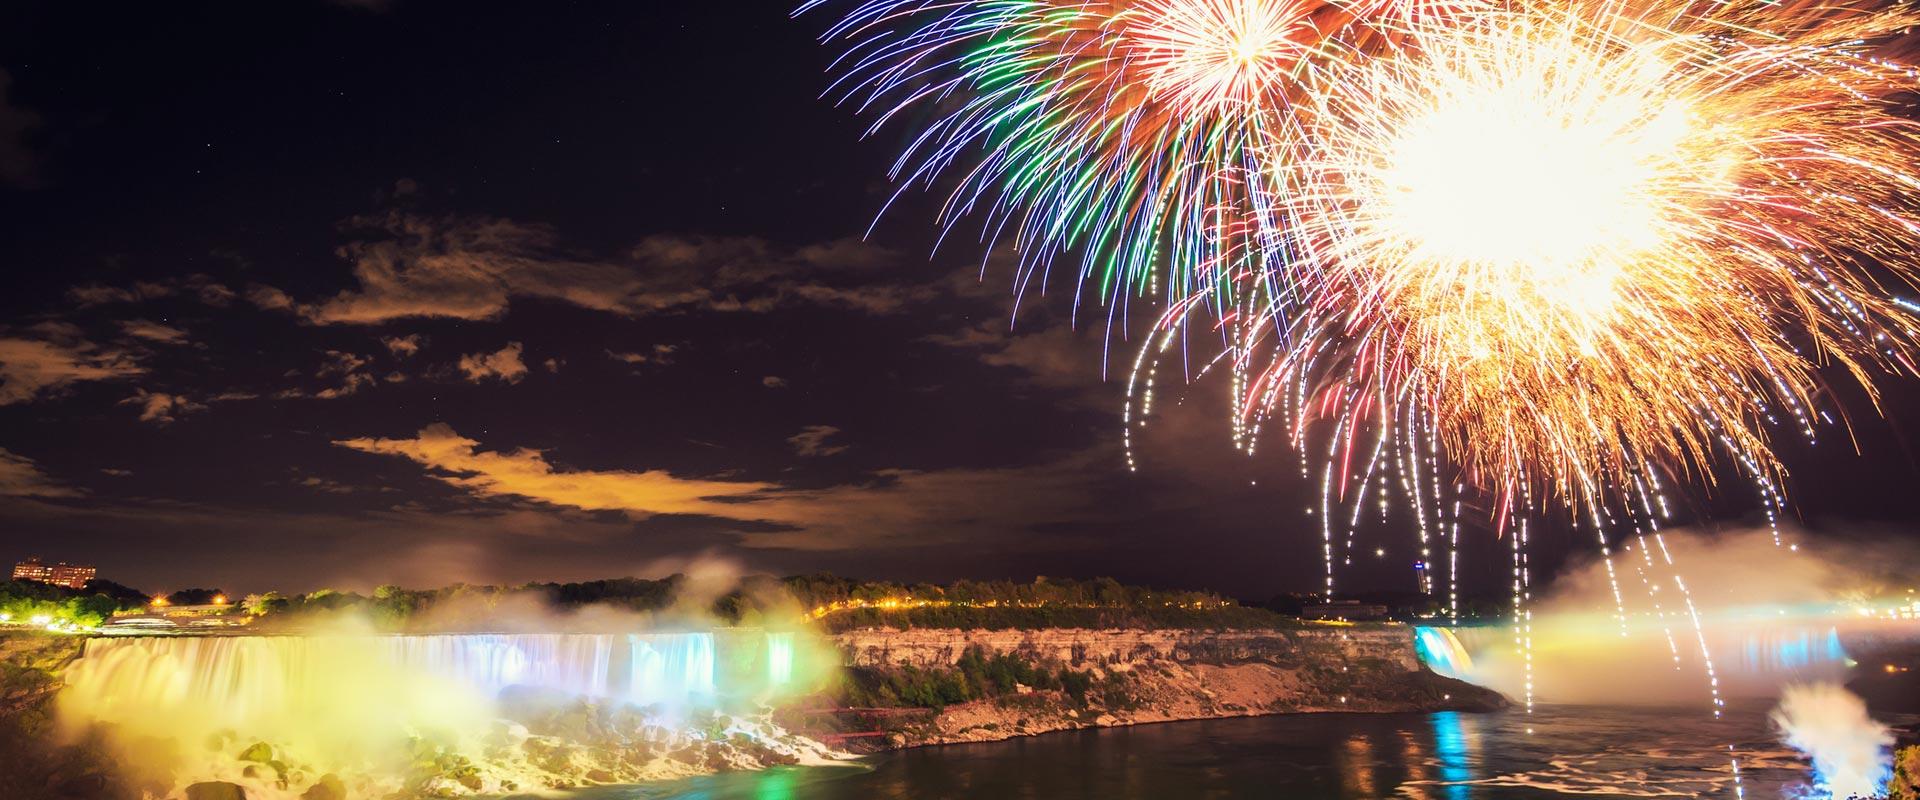 Memorial Day Weekend in Niagara Falls Canada